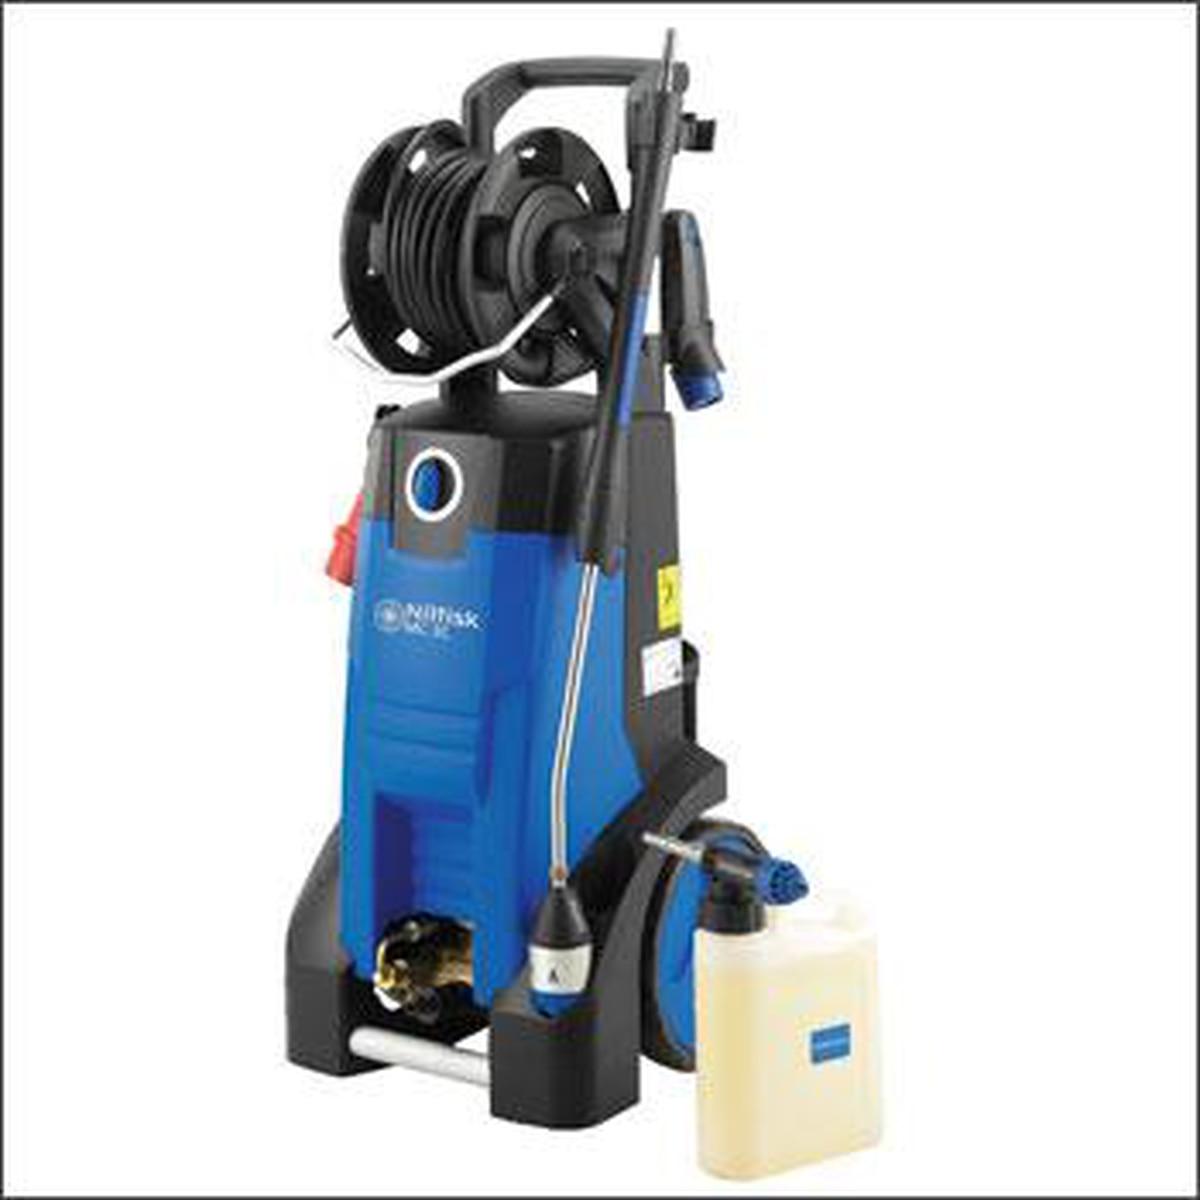 Nilfisk kaldtvanns høytrykksvasker MC 3C-170/820 XT